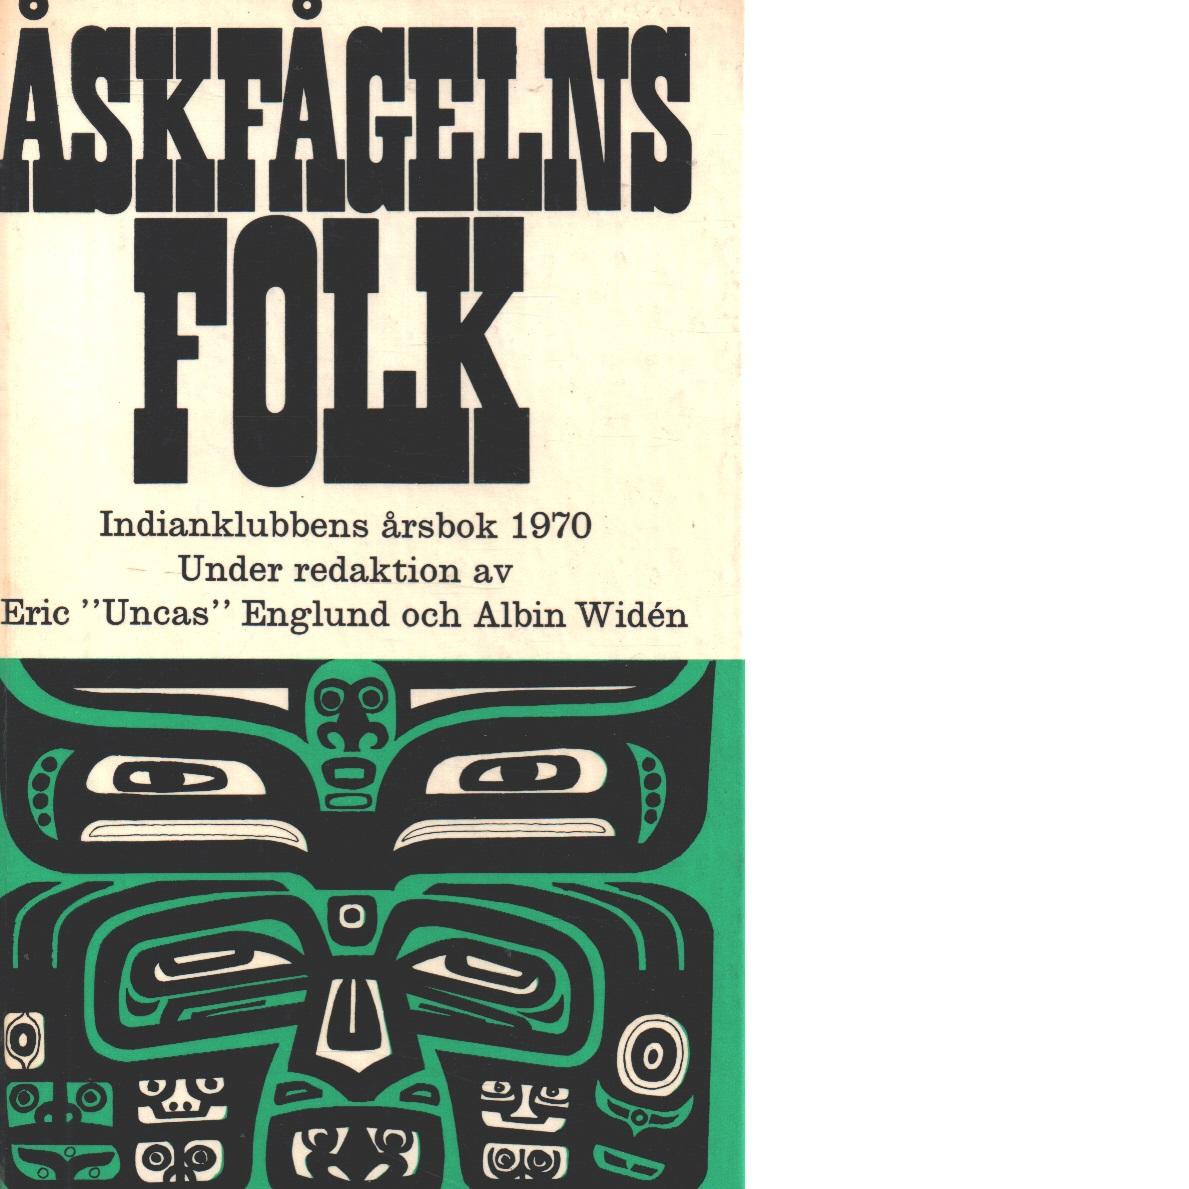 Åskfågelns folk indianklubbens årsbok 1970. - Red.